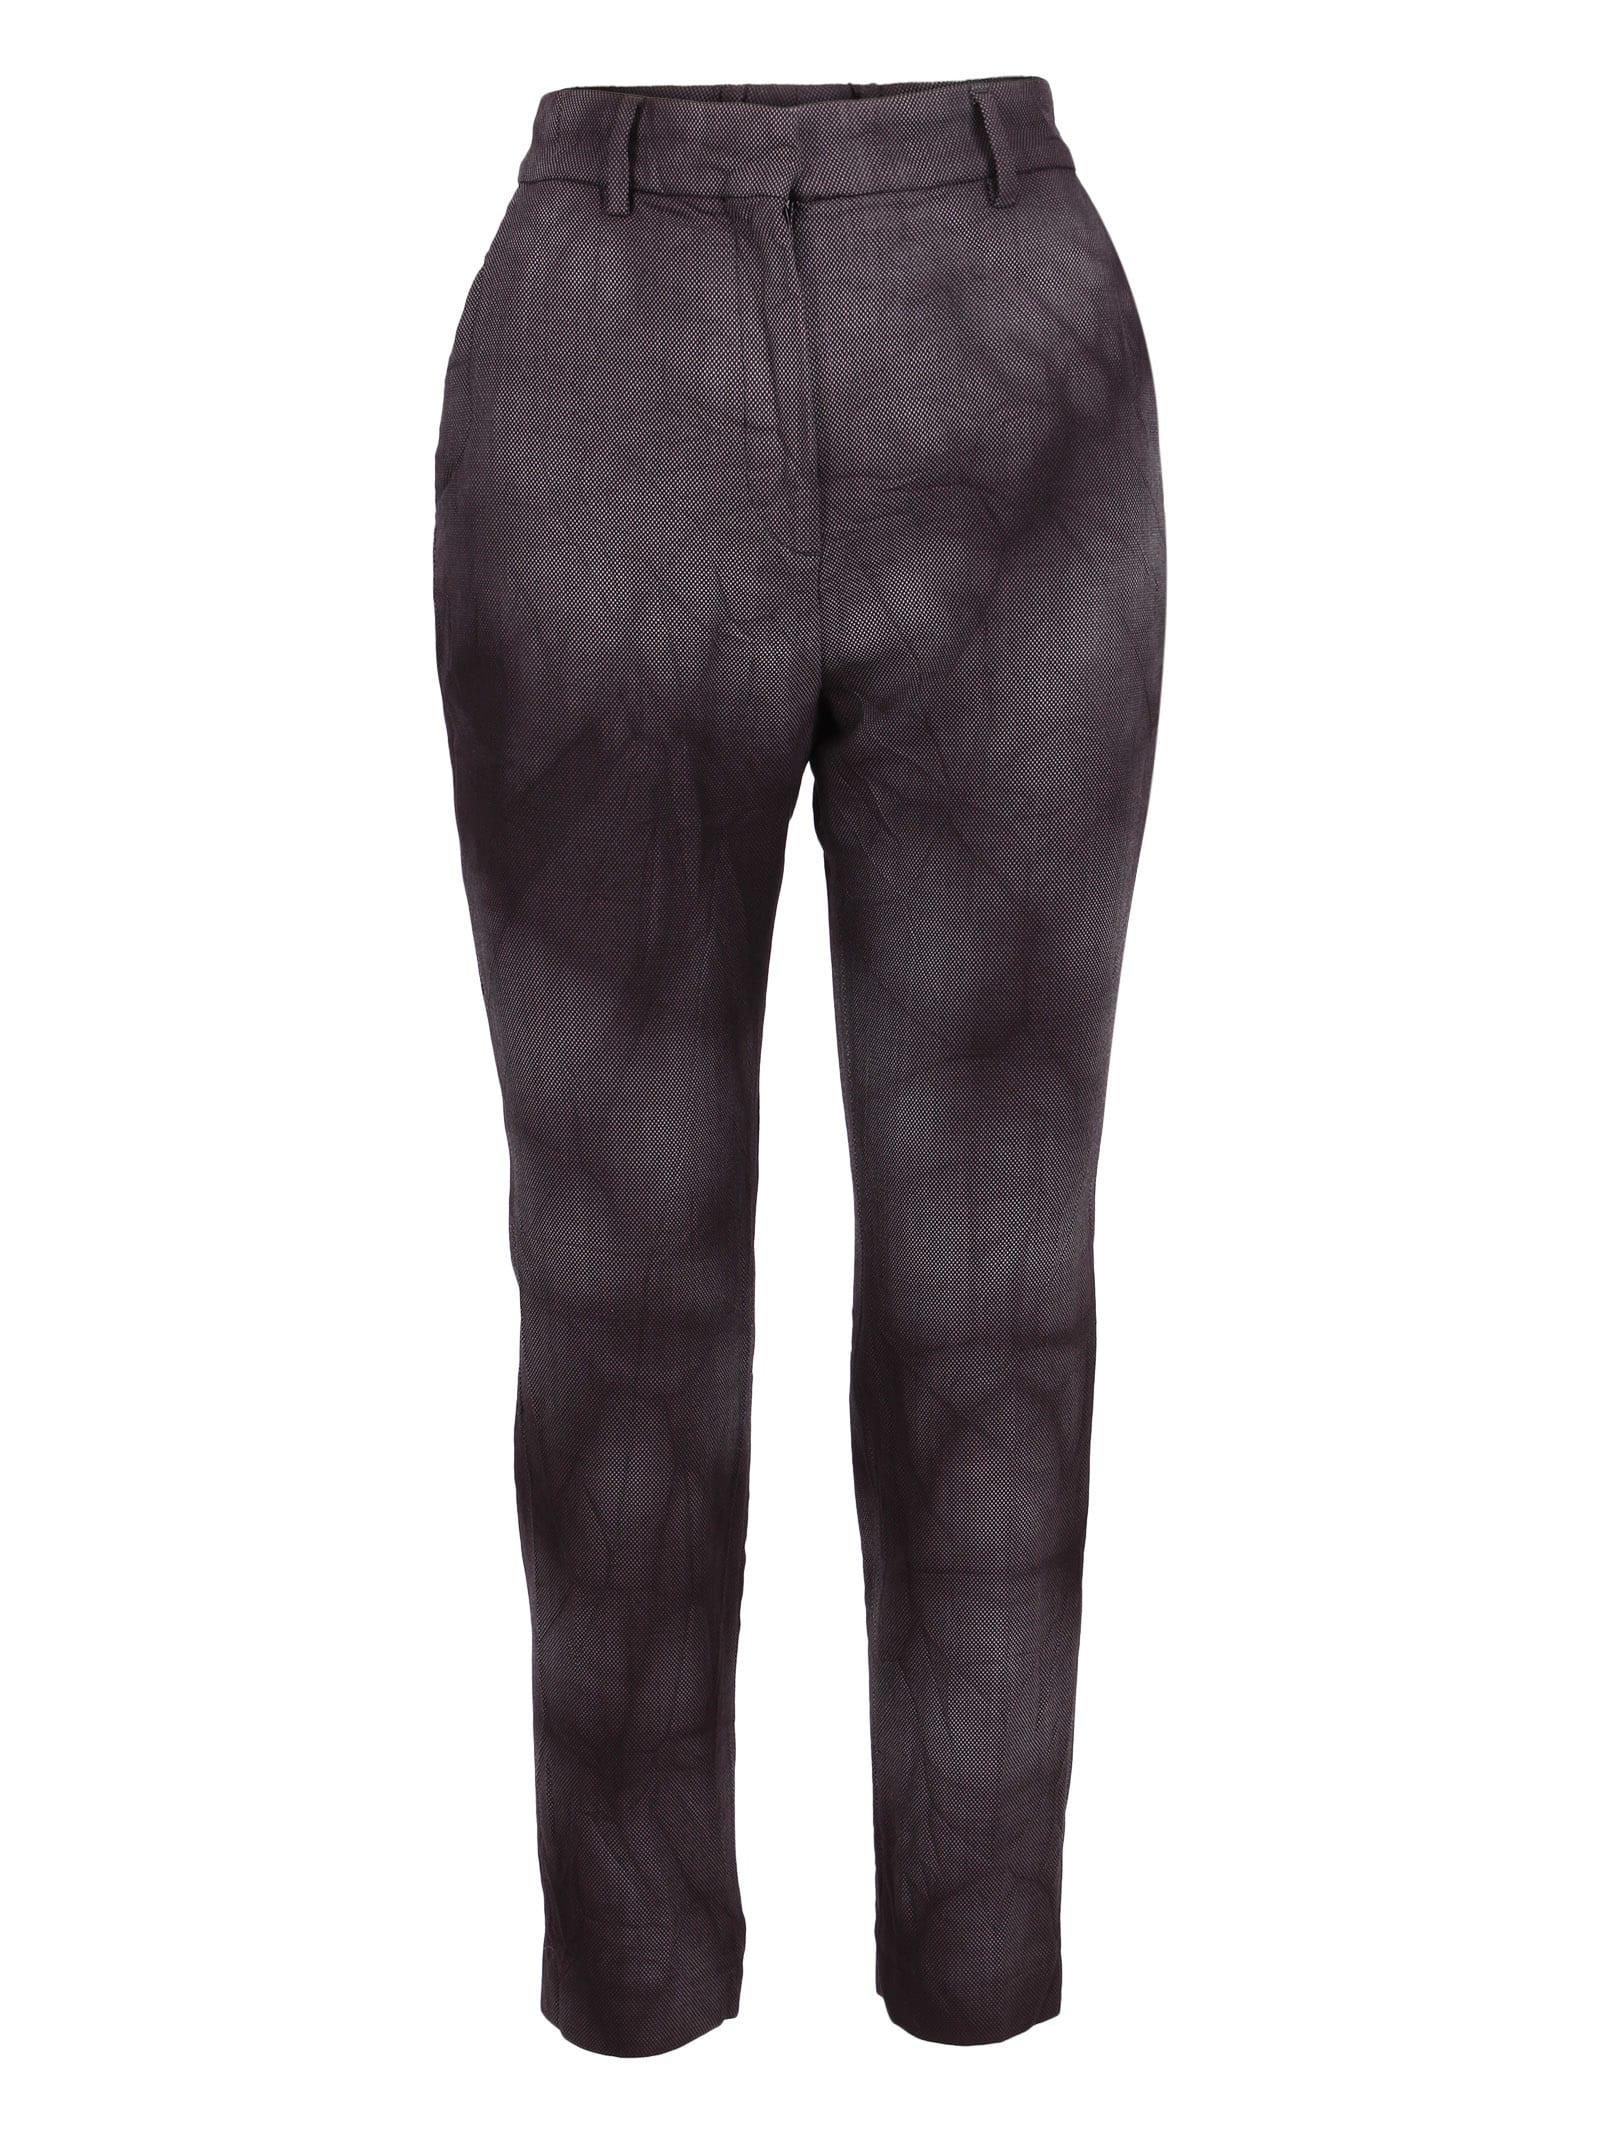 Barena Venezia Leonida Fumana Wool Trousers In Anthracite